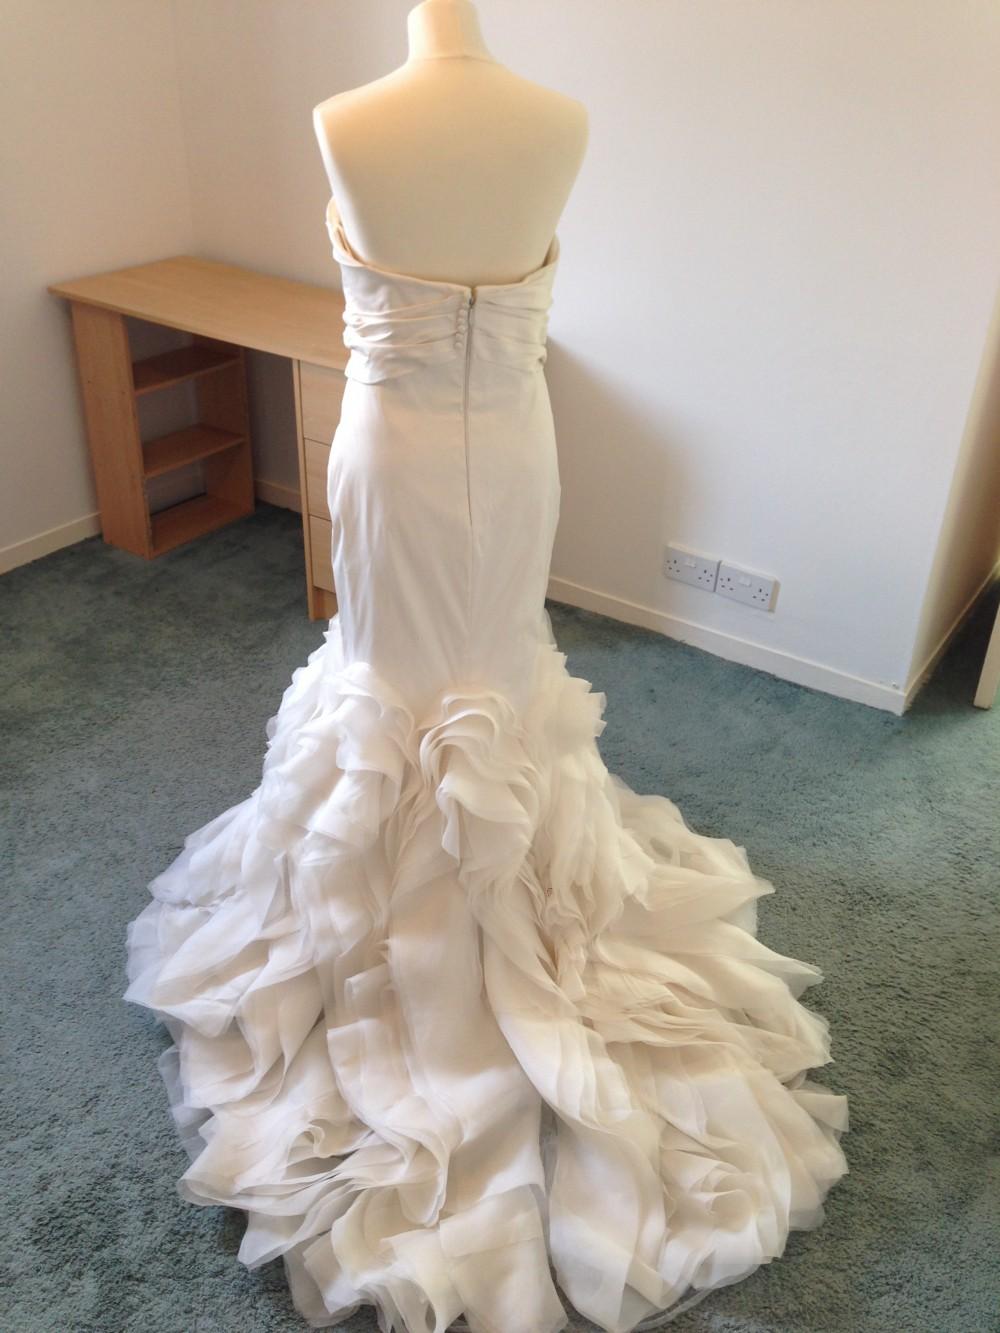 Vera wang ethel second hand wedding dress on sale 63 off for Second hand wedding dresses san diego